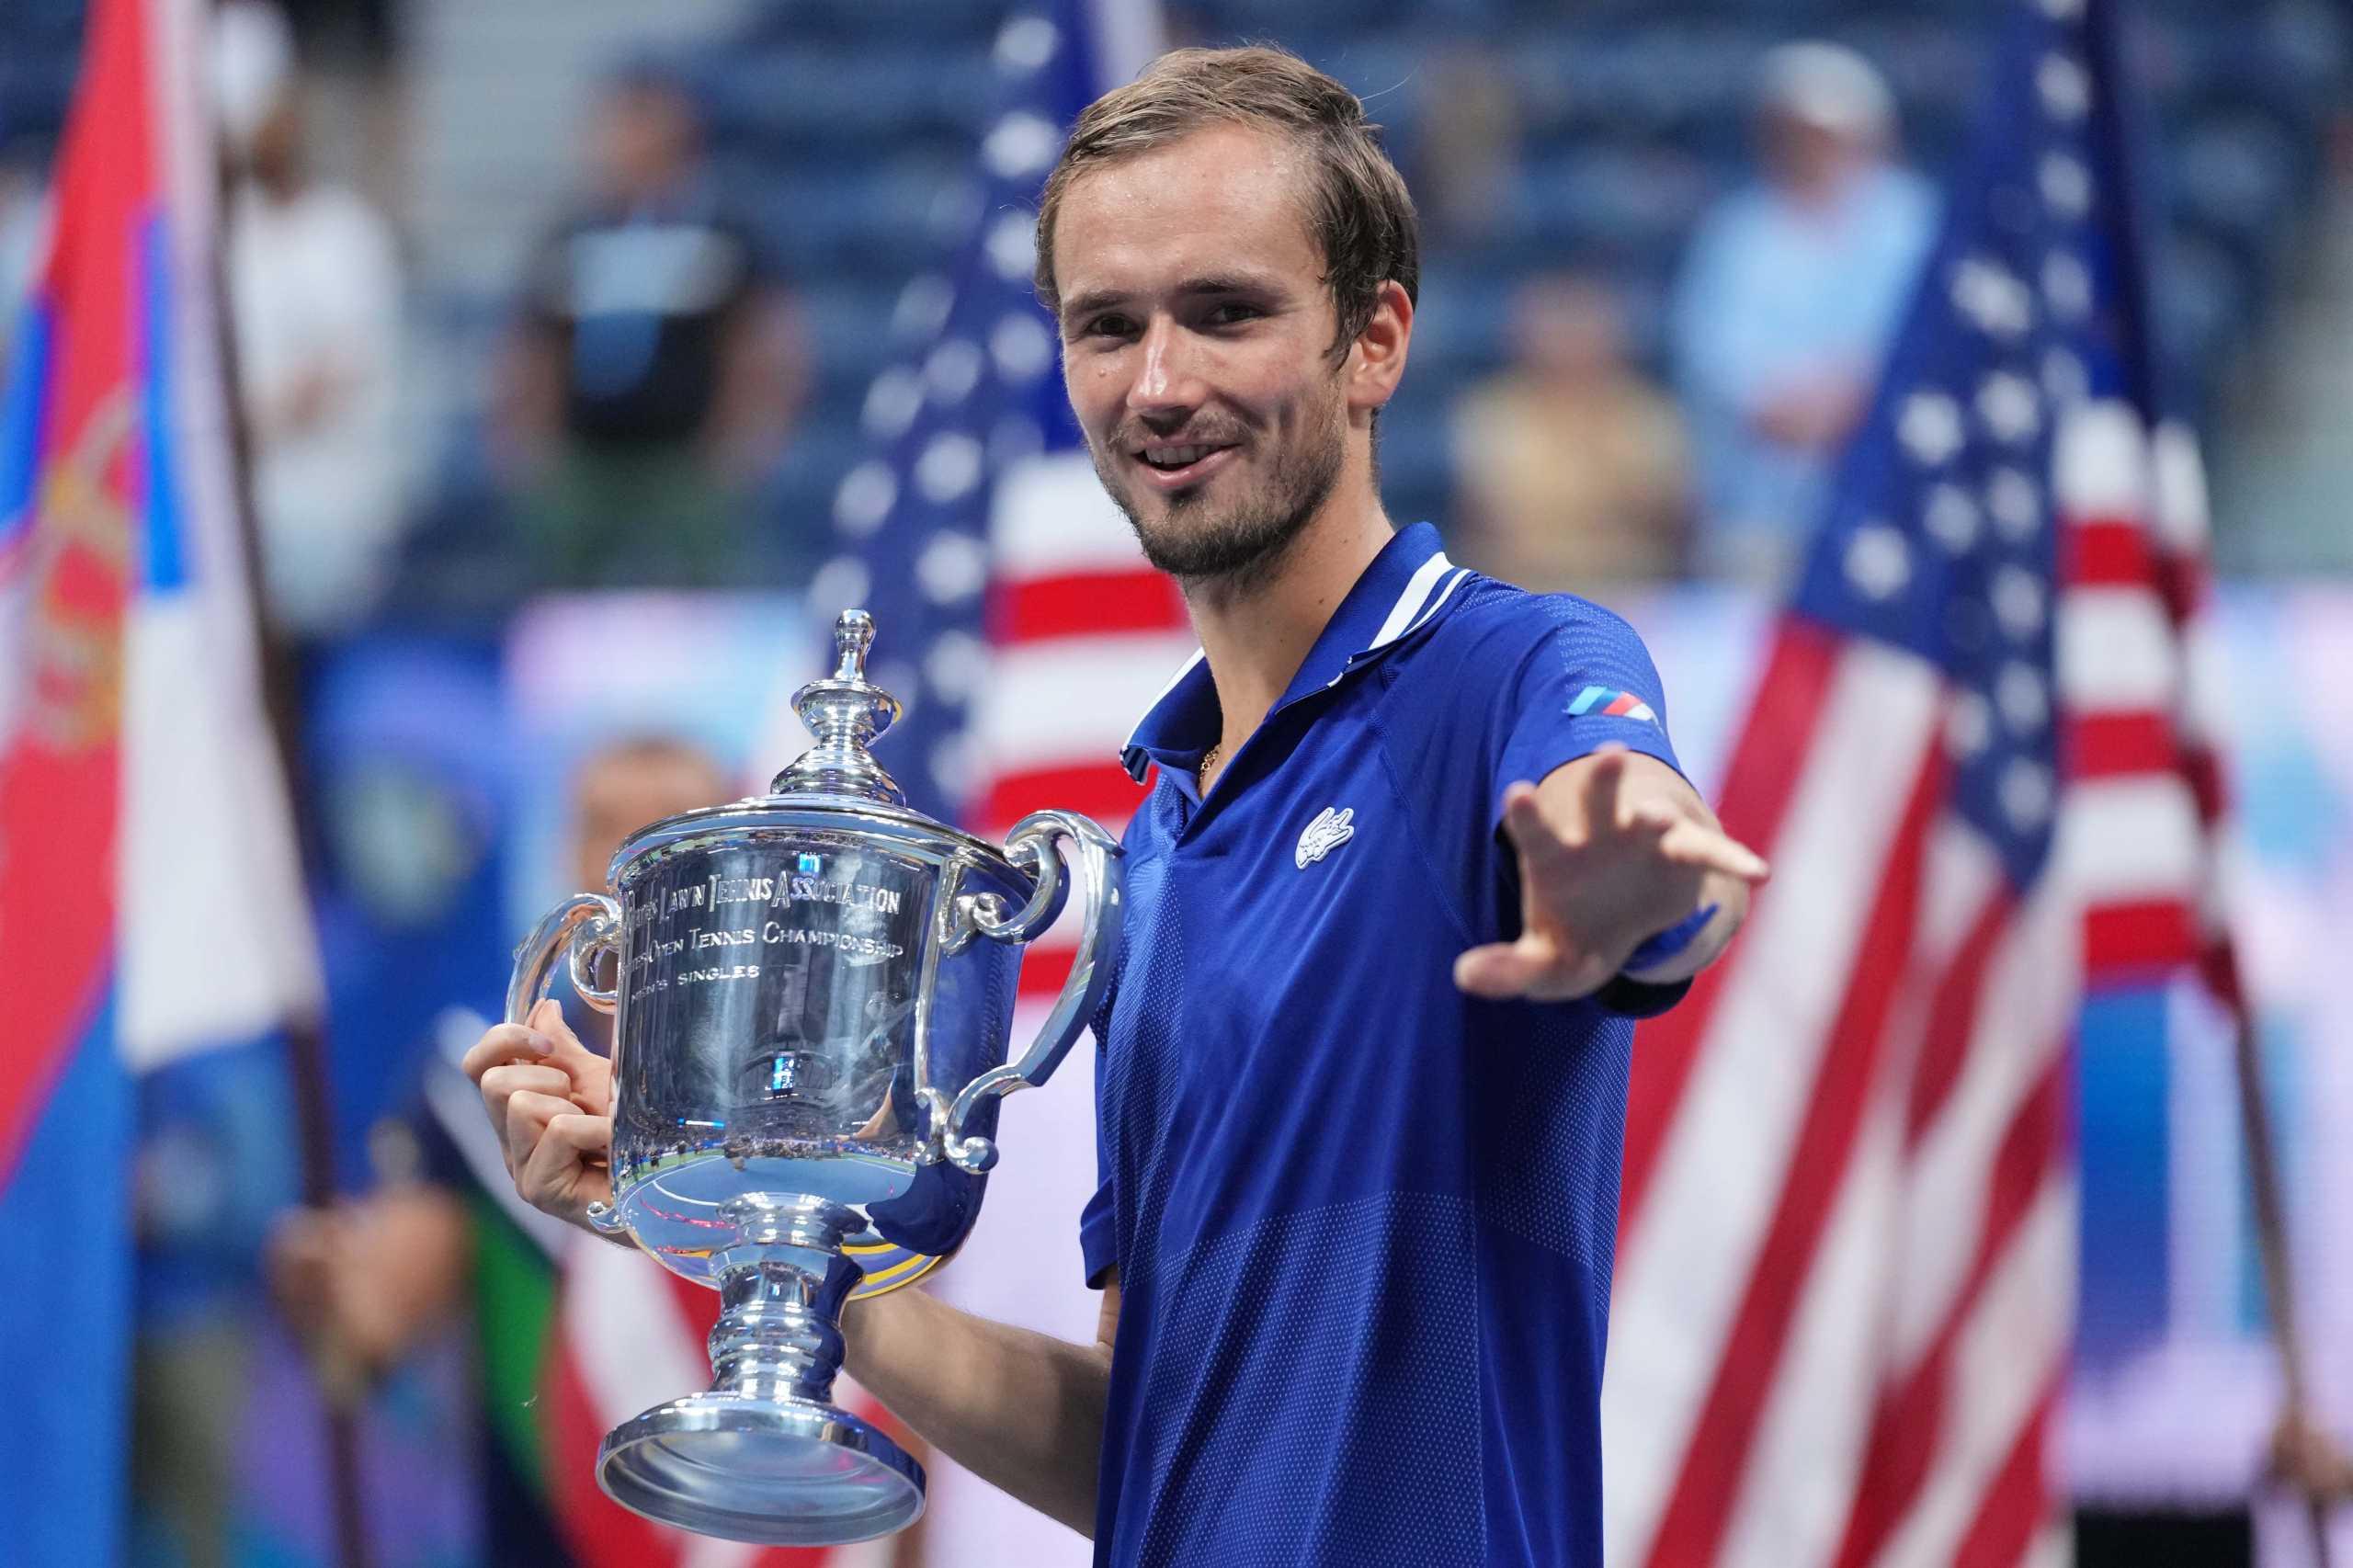 US Open: Ο Μεντβέντεφ διέλυσε τον Τζόκοβιτς και του κατέστρεψε το όνειρο